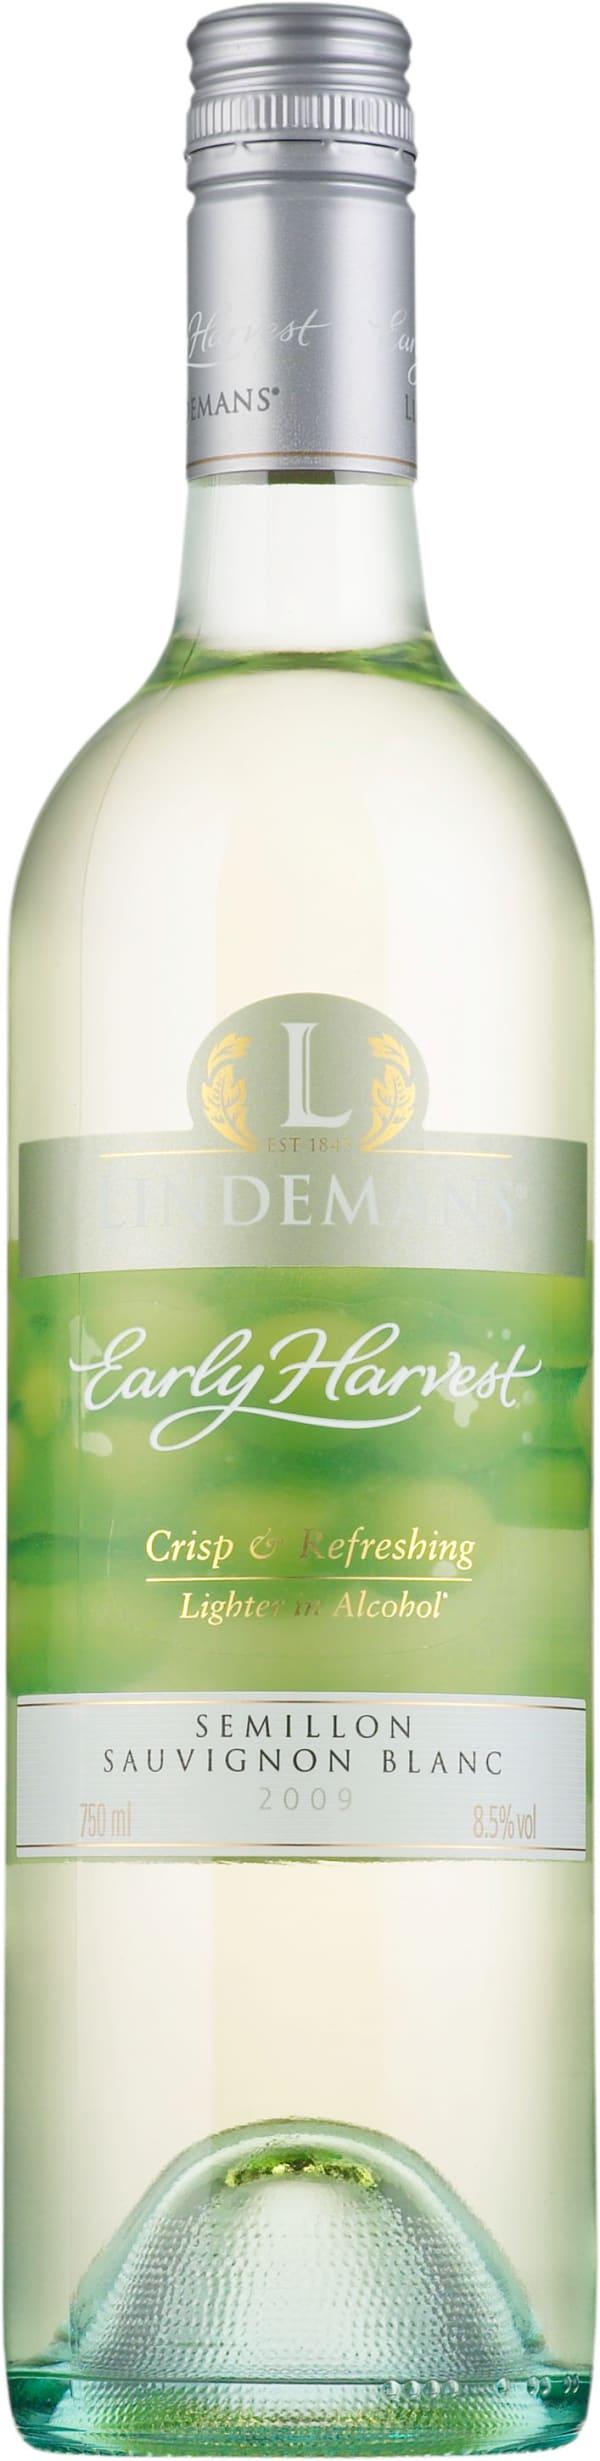 Lindemans Early Harvest Semillon Sauvignon Blanc 2016